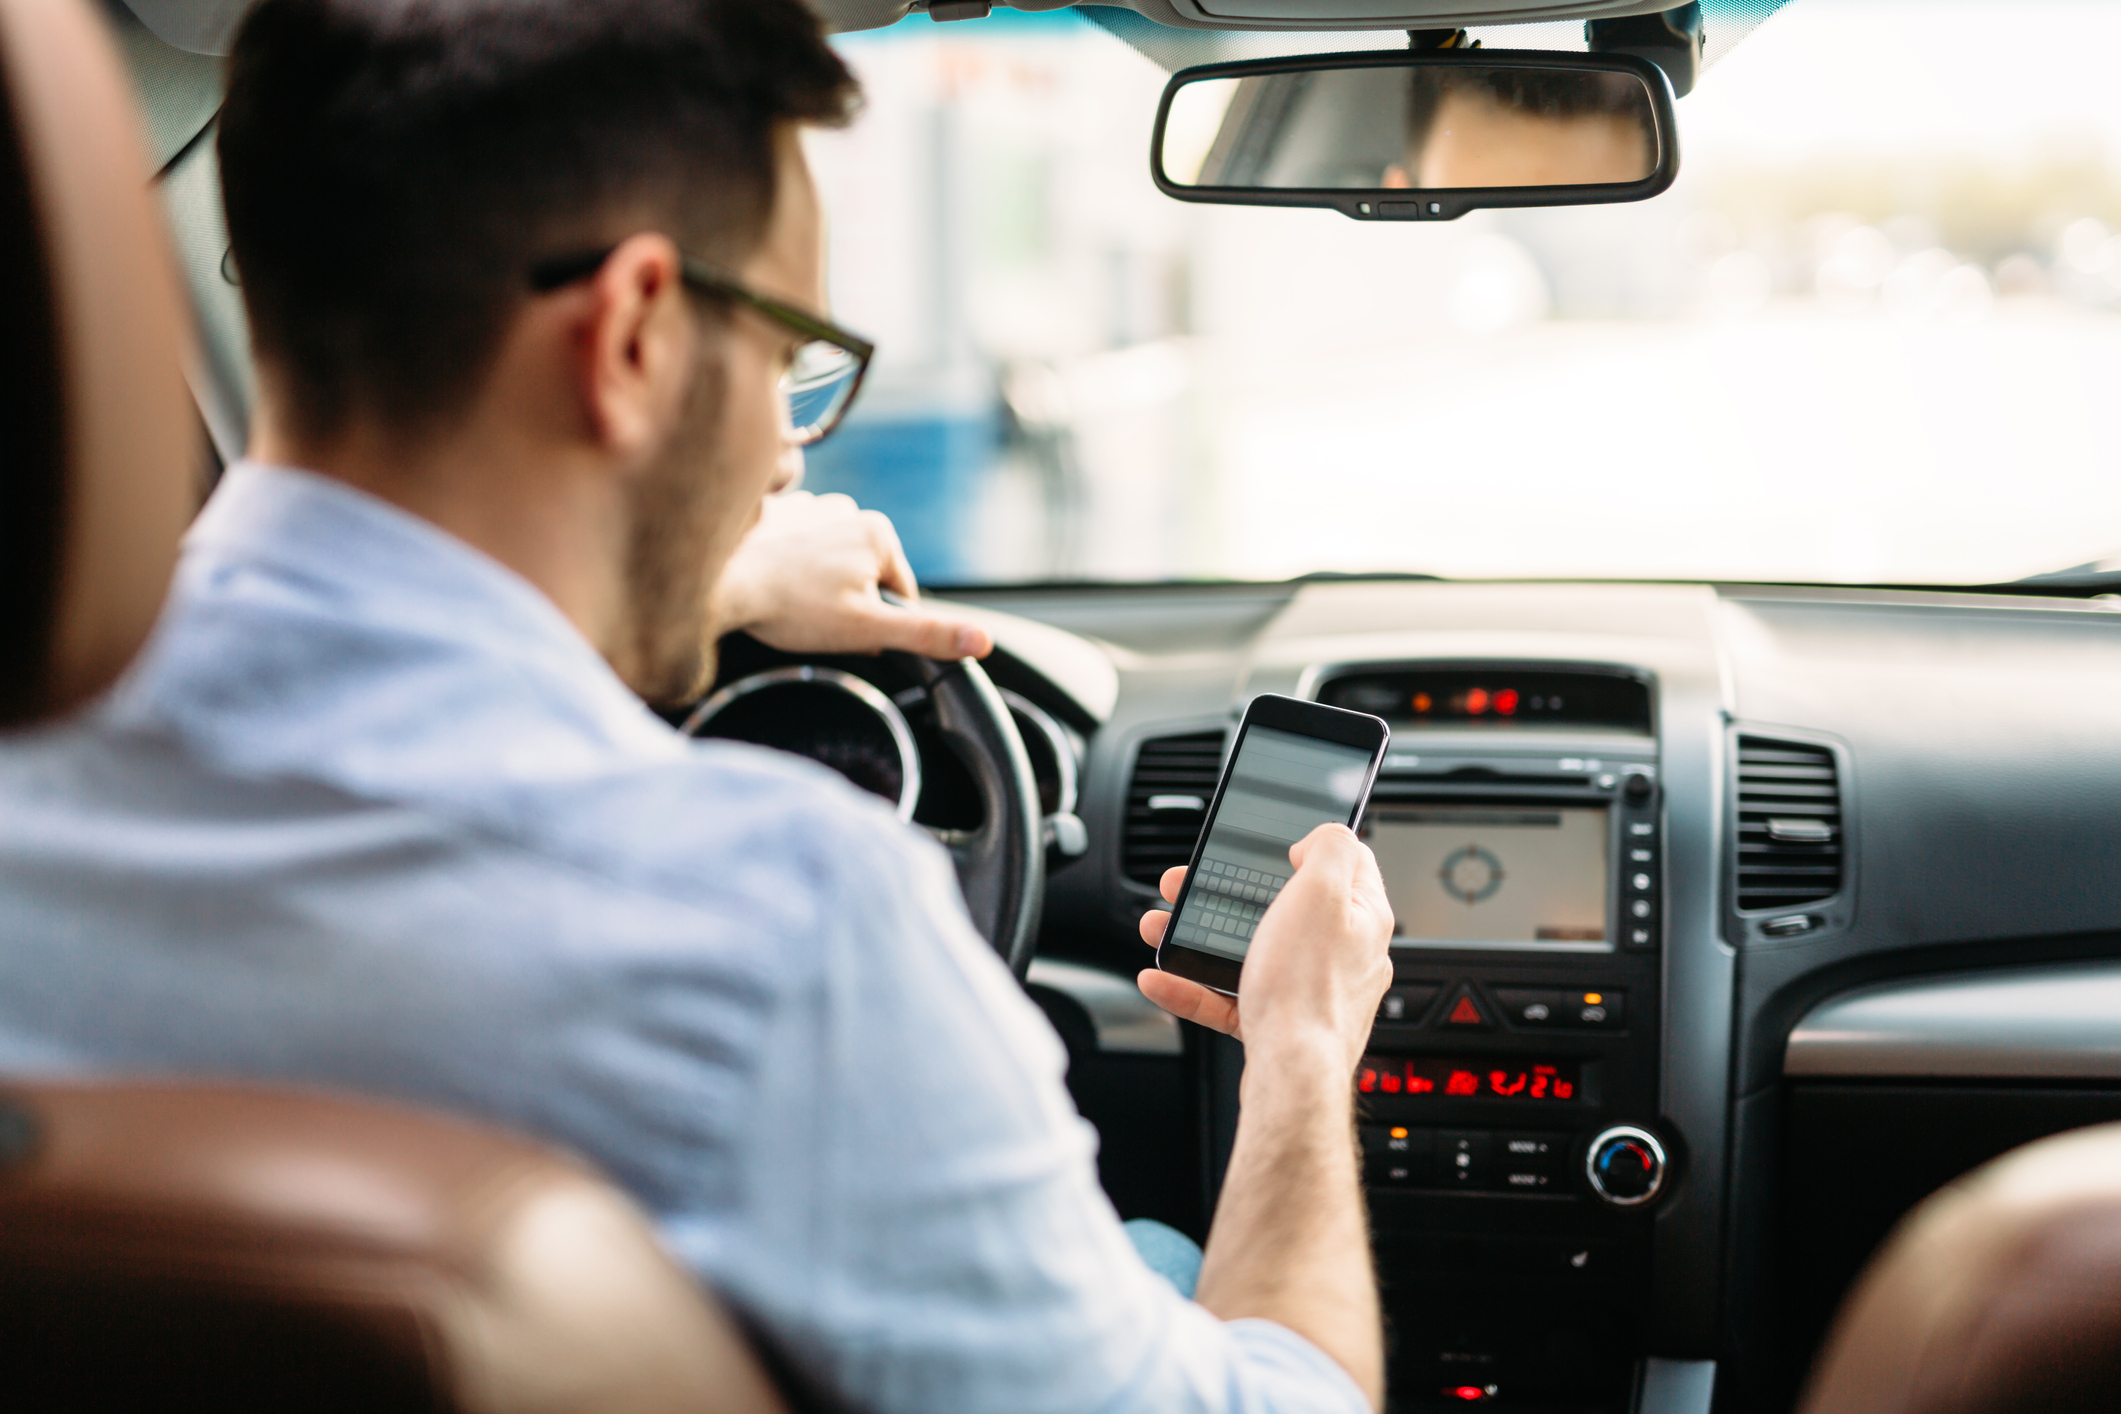 Senado eleva rendimento de motorista de aplicativo até outubro